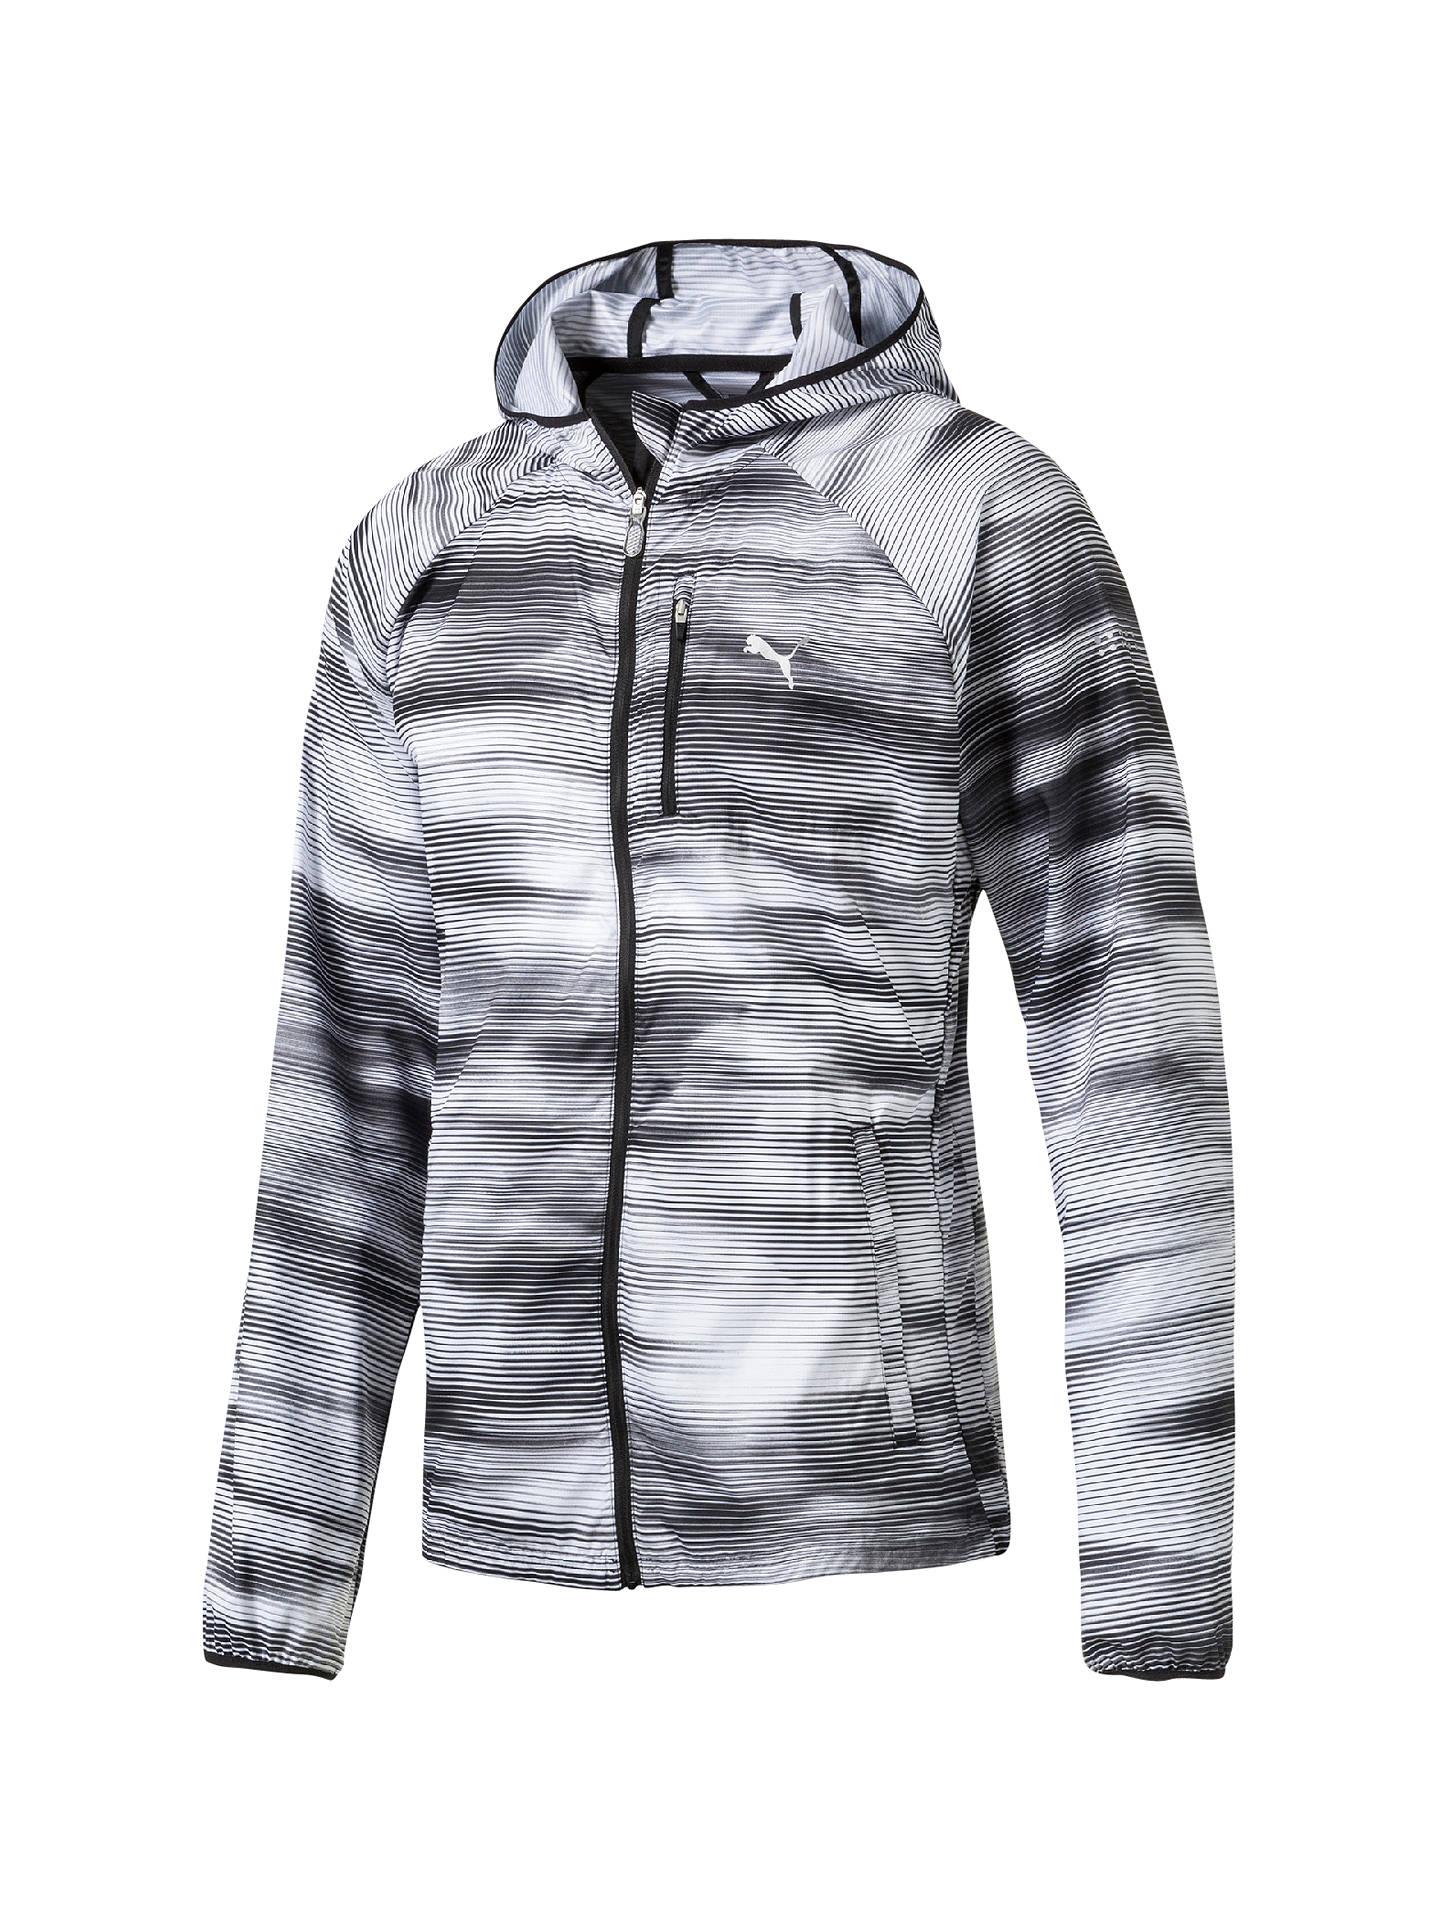 f3069ab3 Puma LastLap Graphic Men's Running Jacket, Grey at John Lewis & Partners